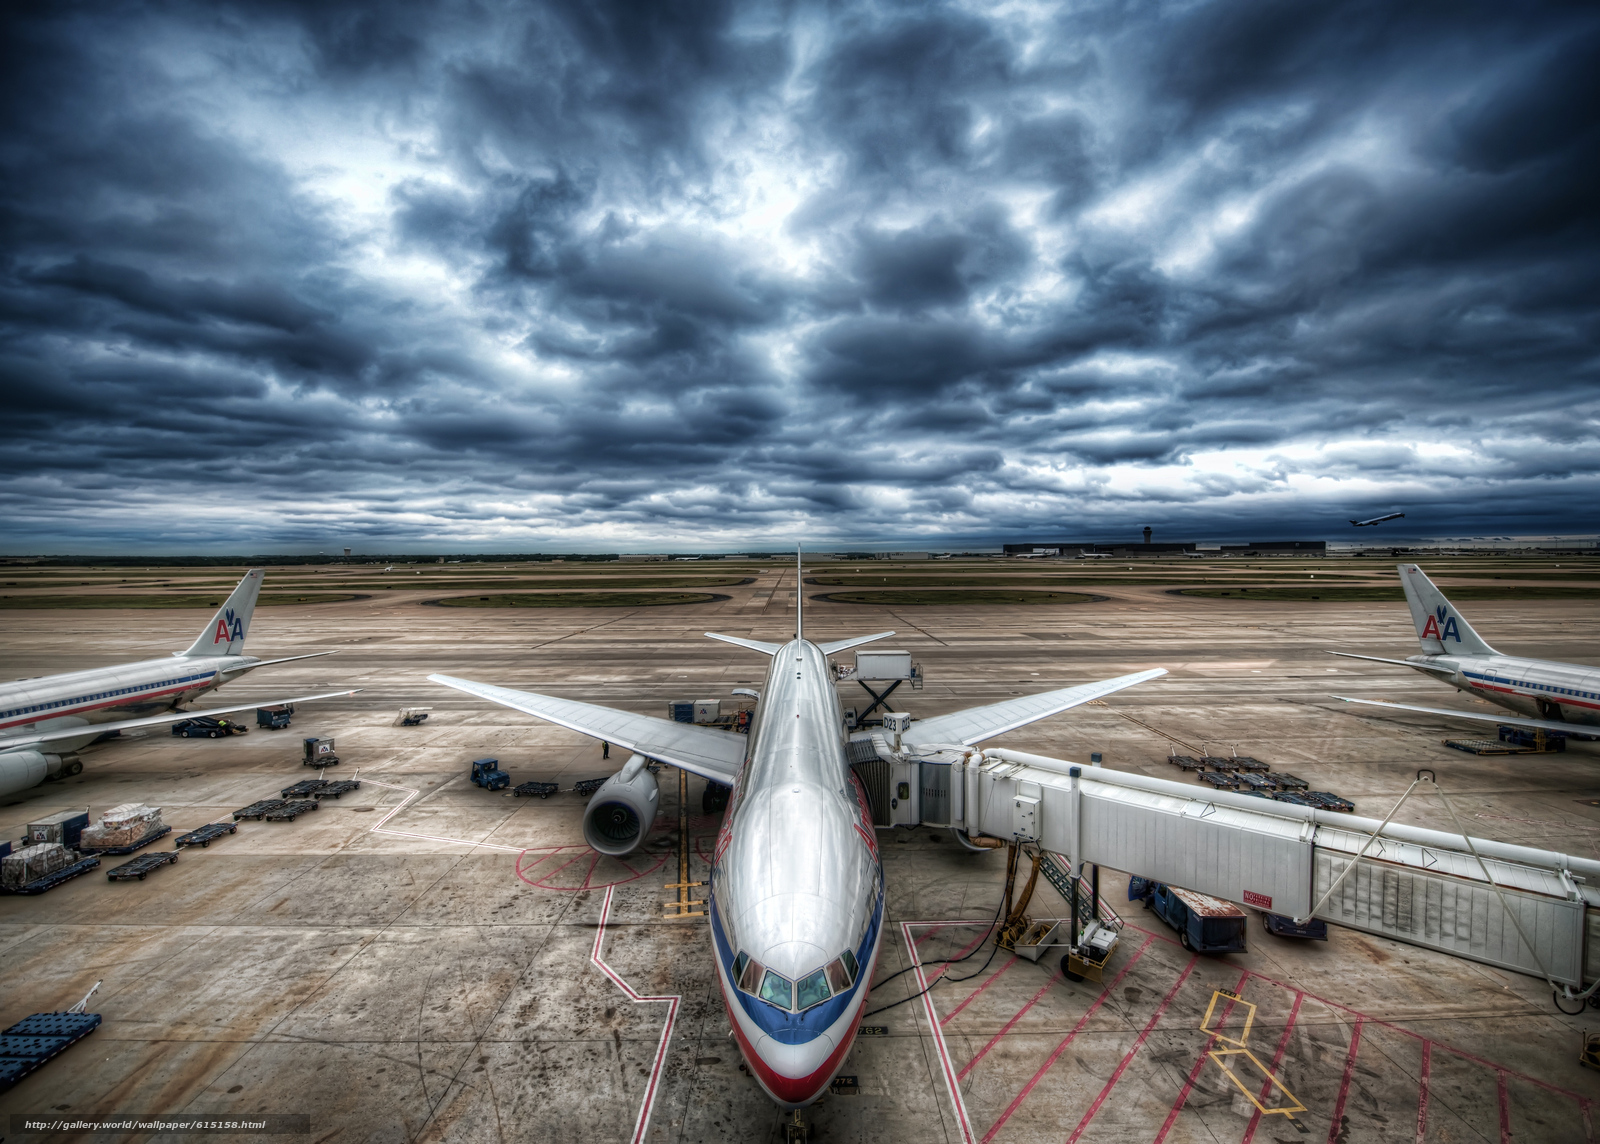 самолет, авиация, небо, тучи, грозовое небо, аэропорт